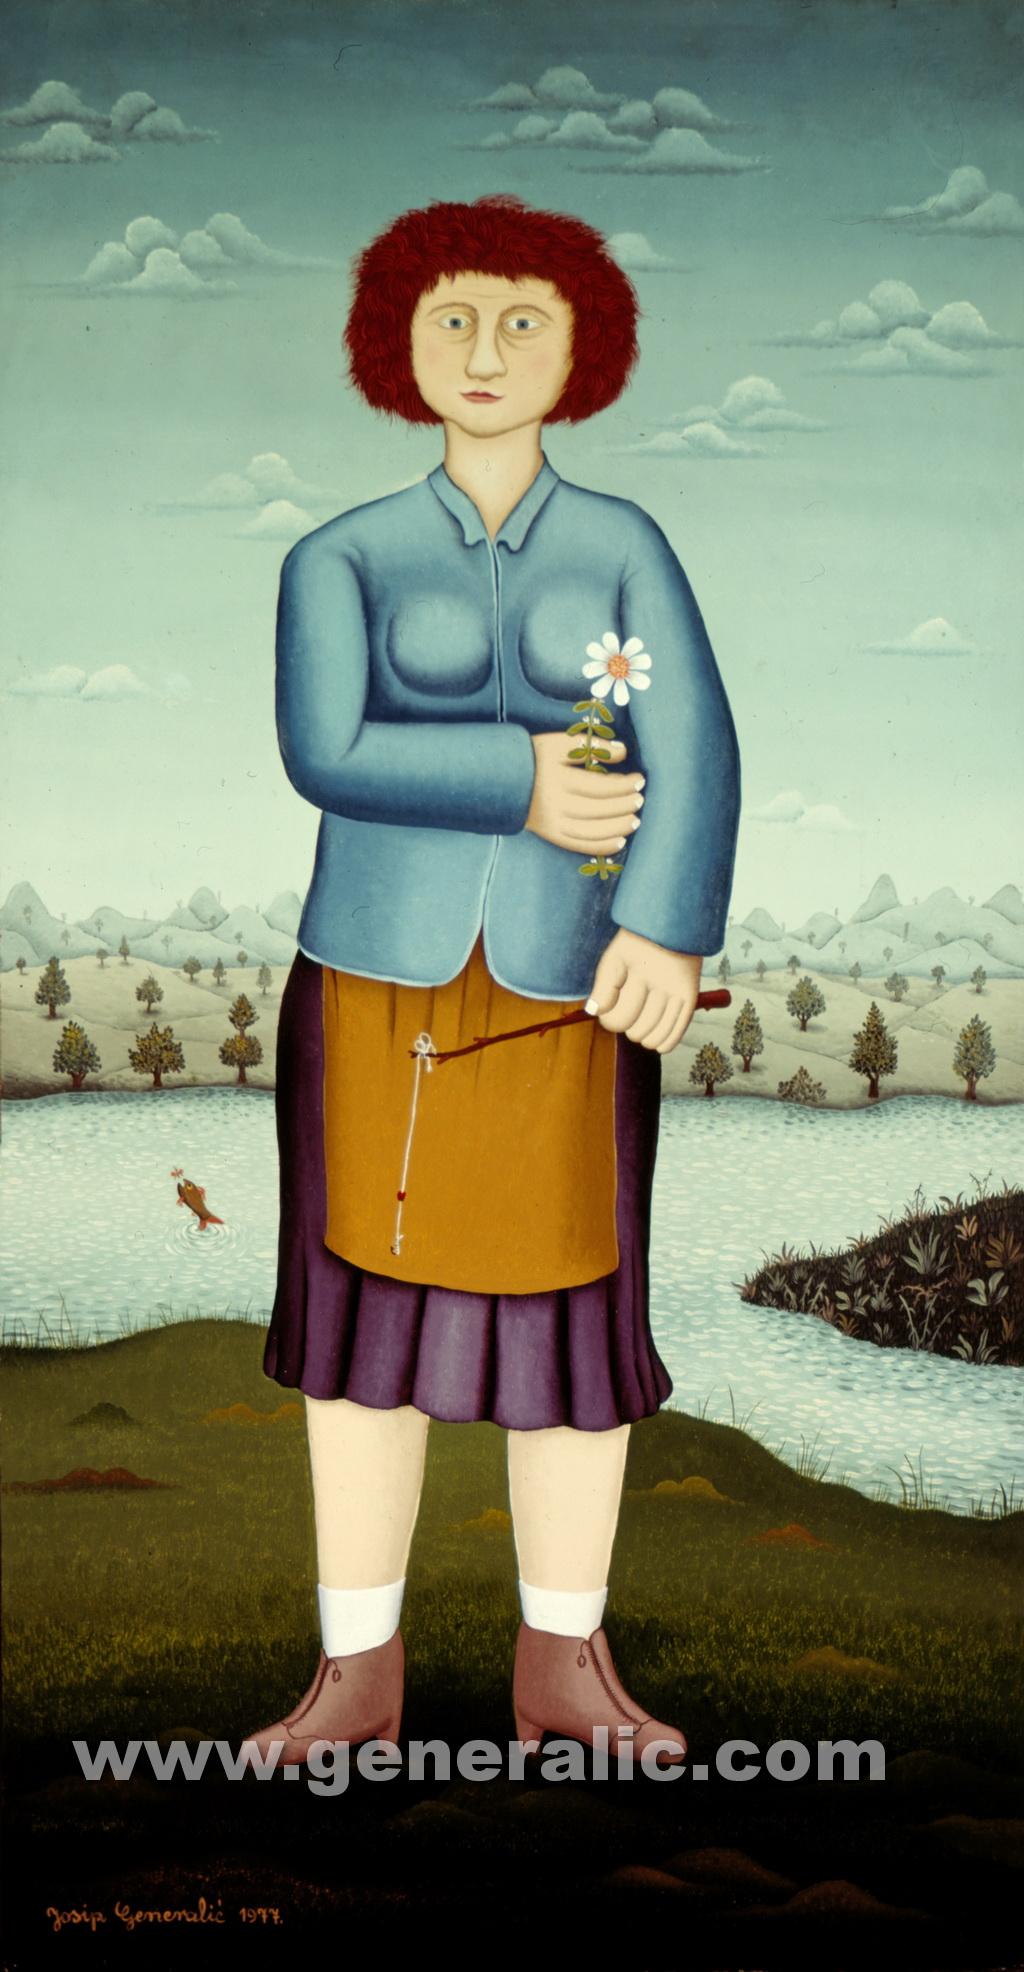 Josip Generalic, 1977, Woman with flower, oil on canvas